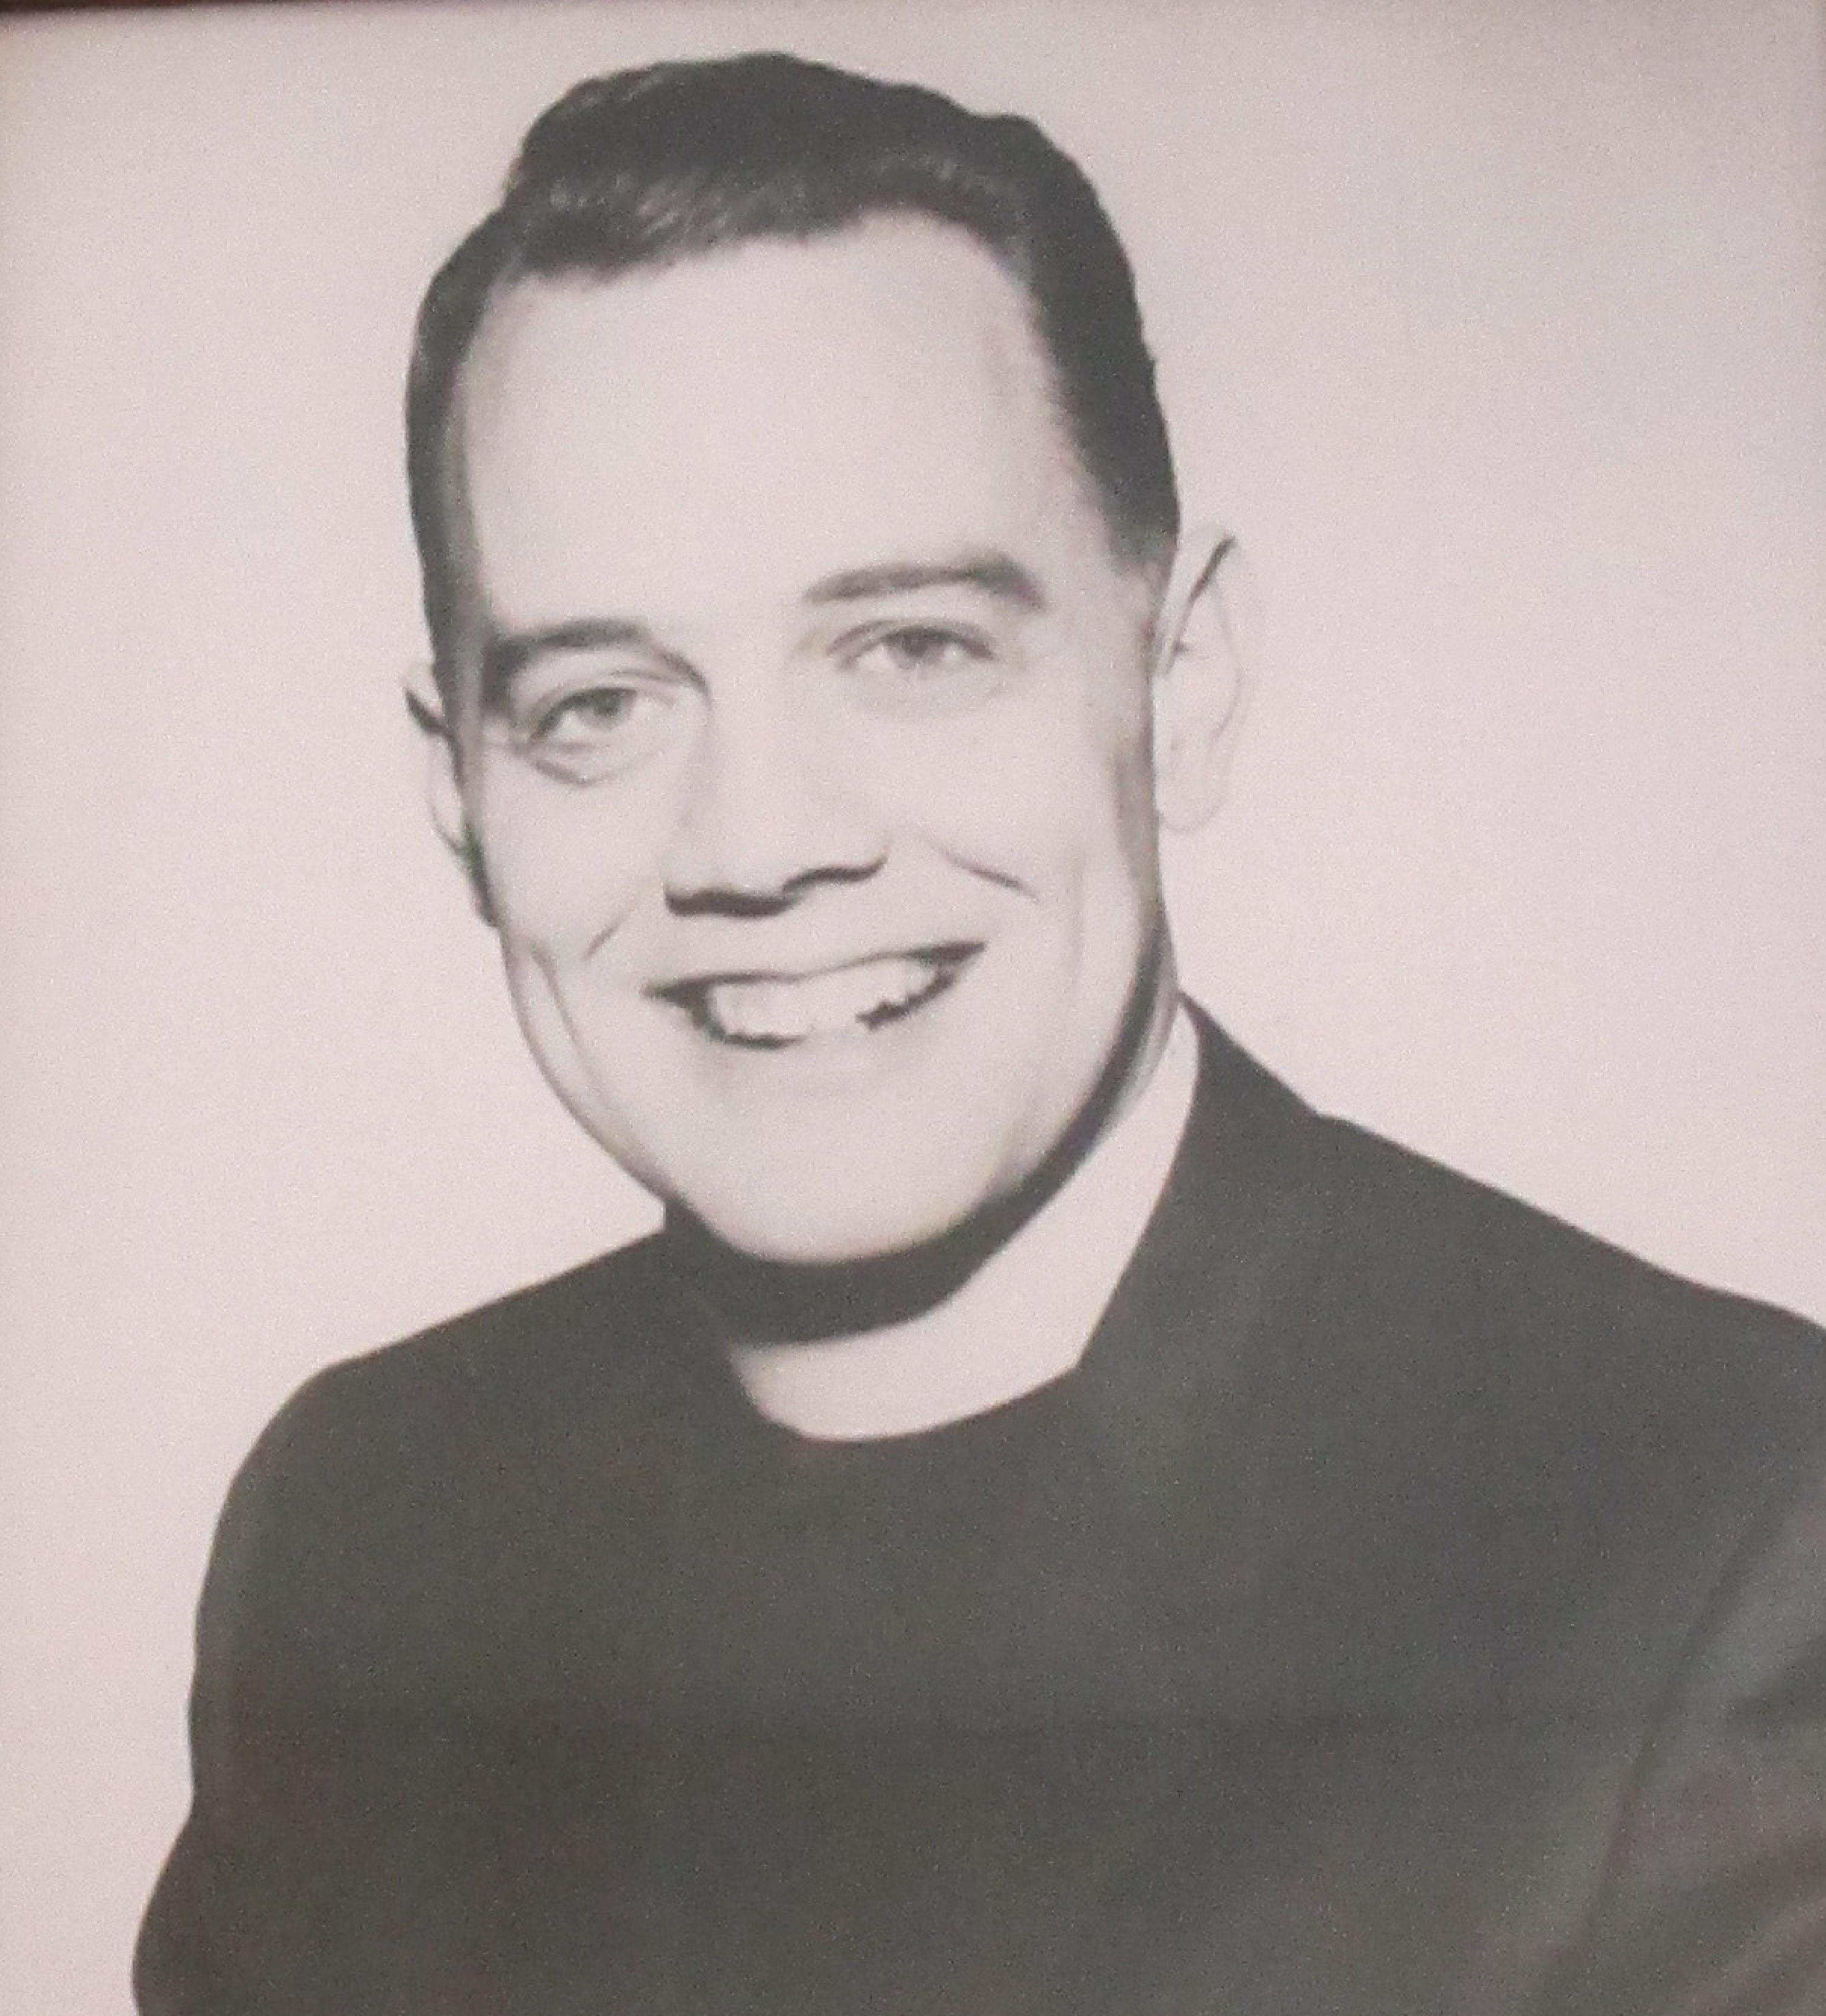 Rev. Bohlmann